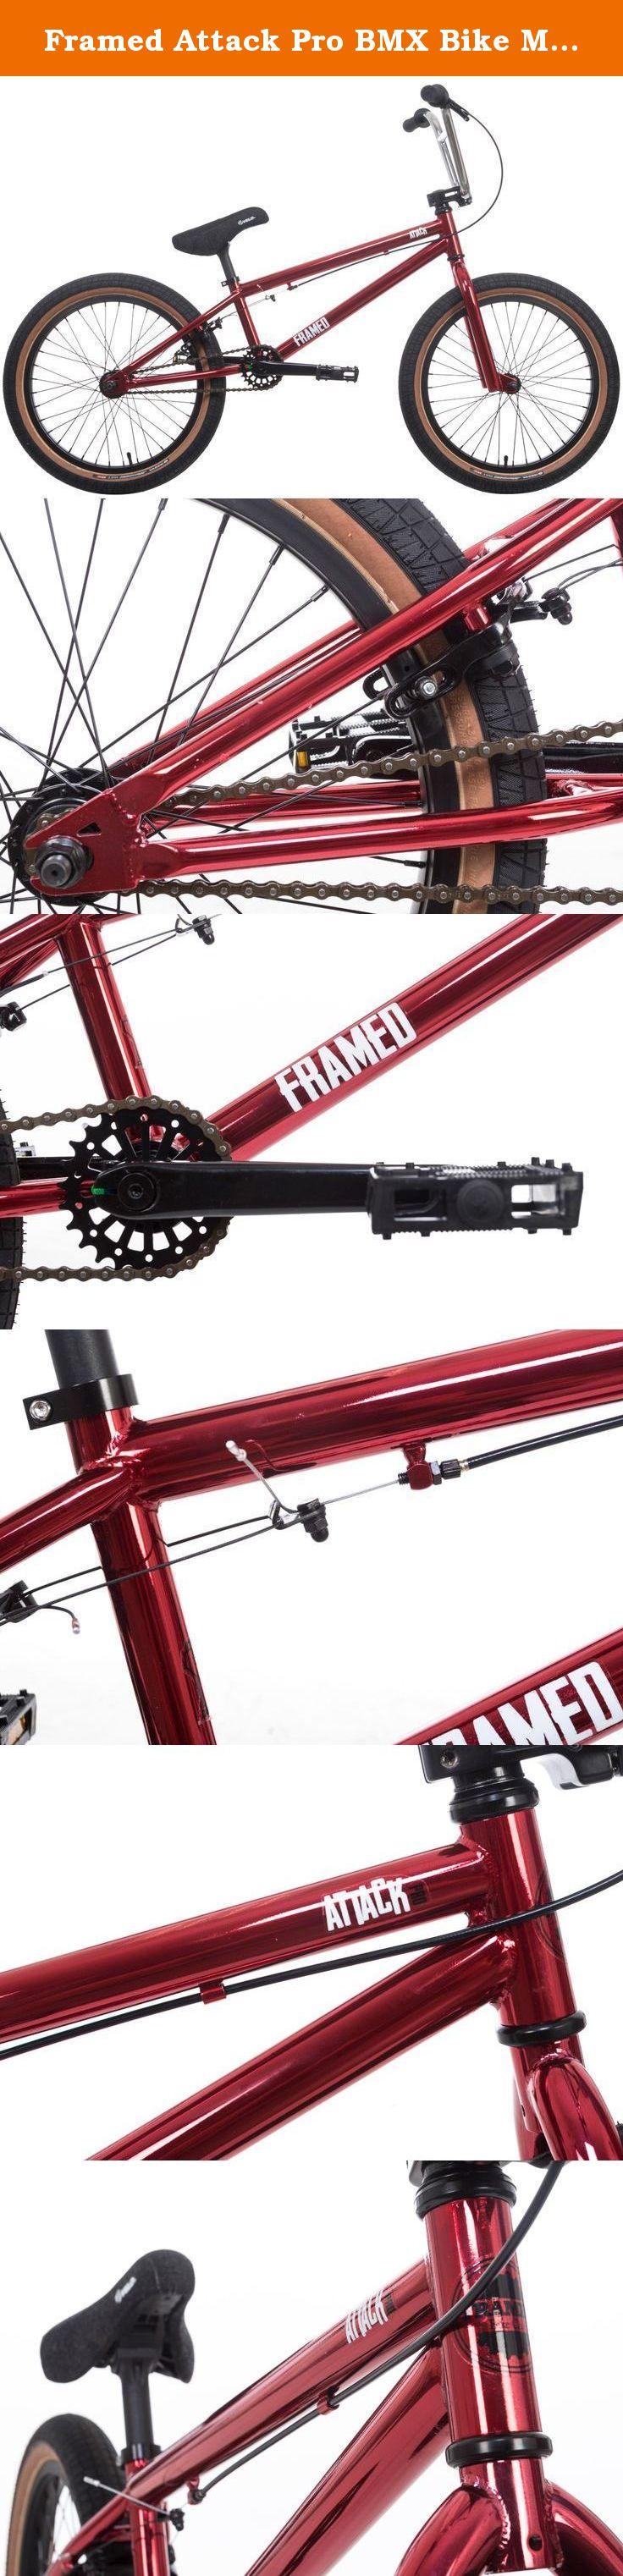 Framed Attack Pro BMX Bike Mens Sz 20in/20.5in Top Tube. Frame ...